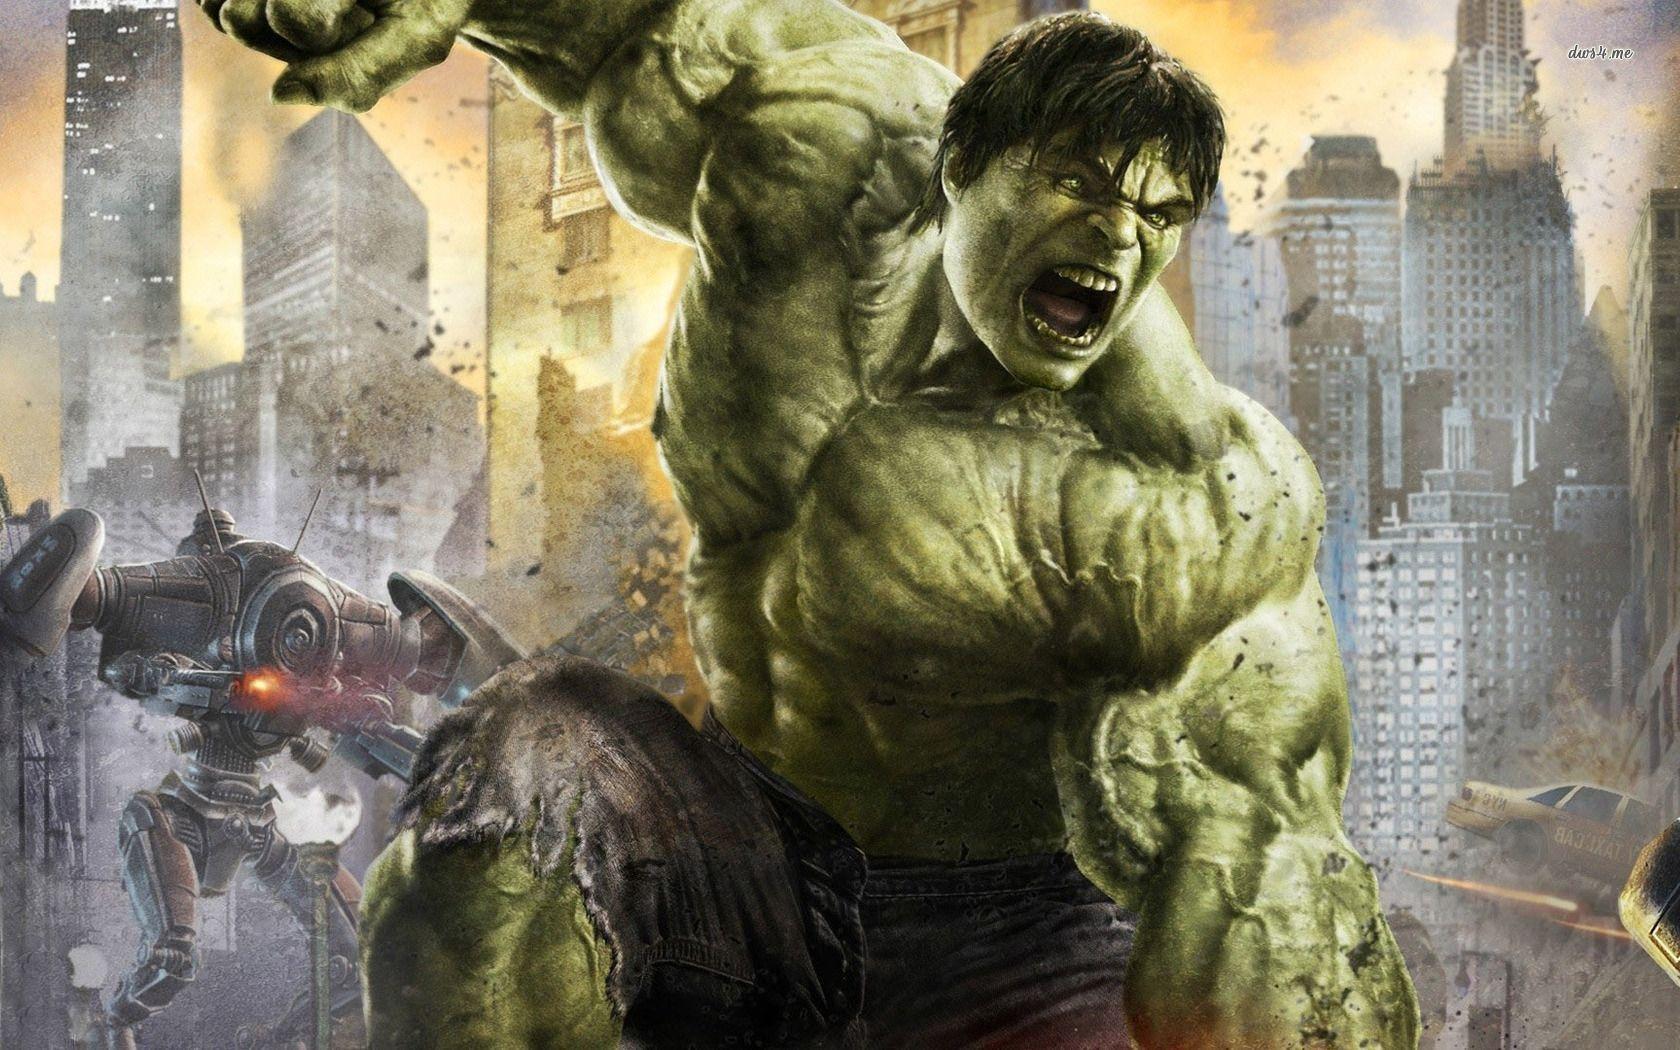 The Incredible Hulk wallpaper - Movie wallpapers - #